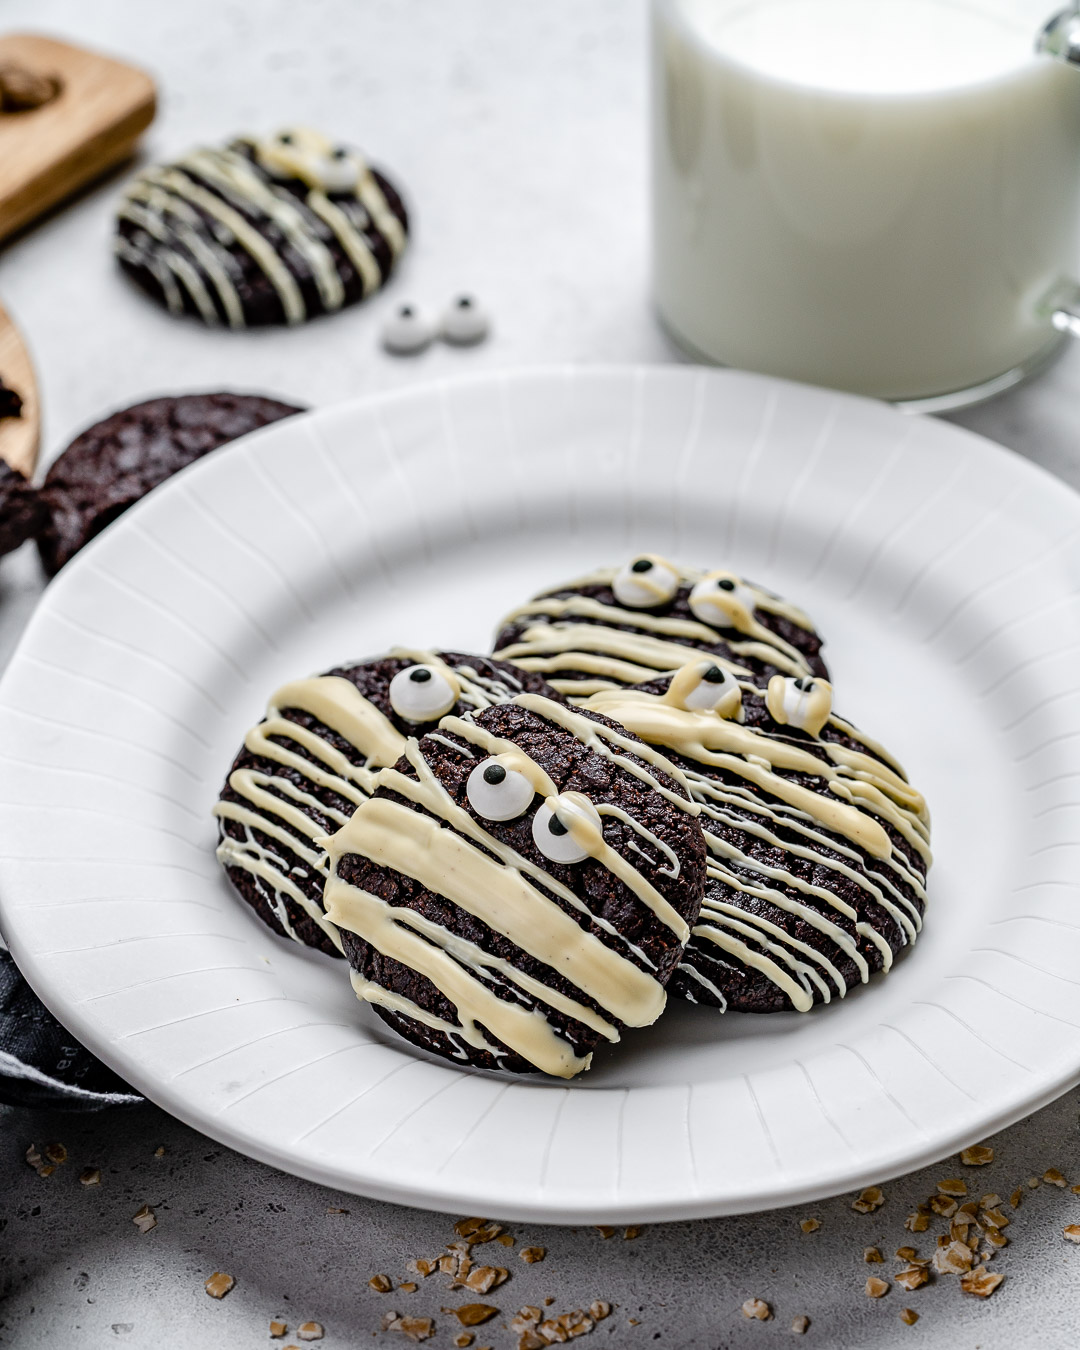 Fursecuri Americane Cu Ciocolata - Reteta Video 9